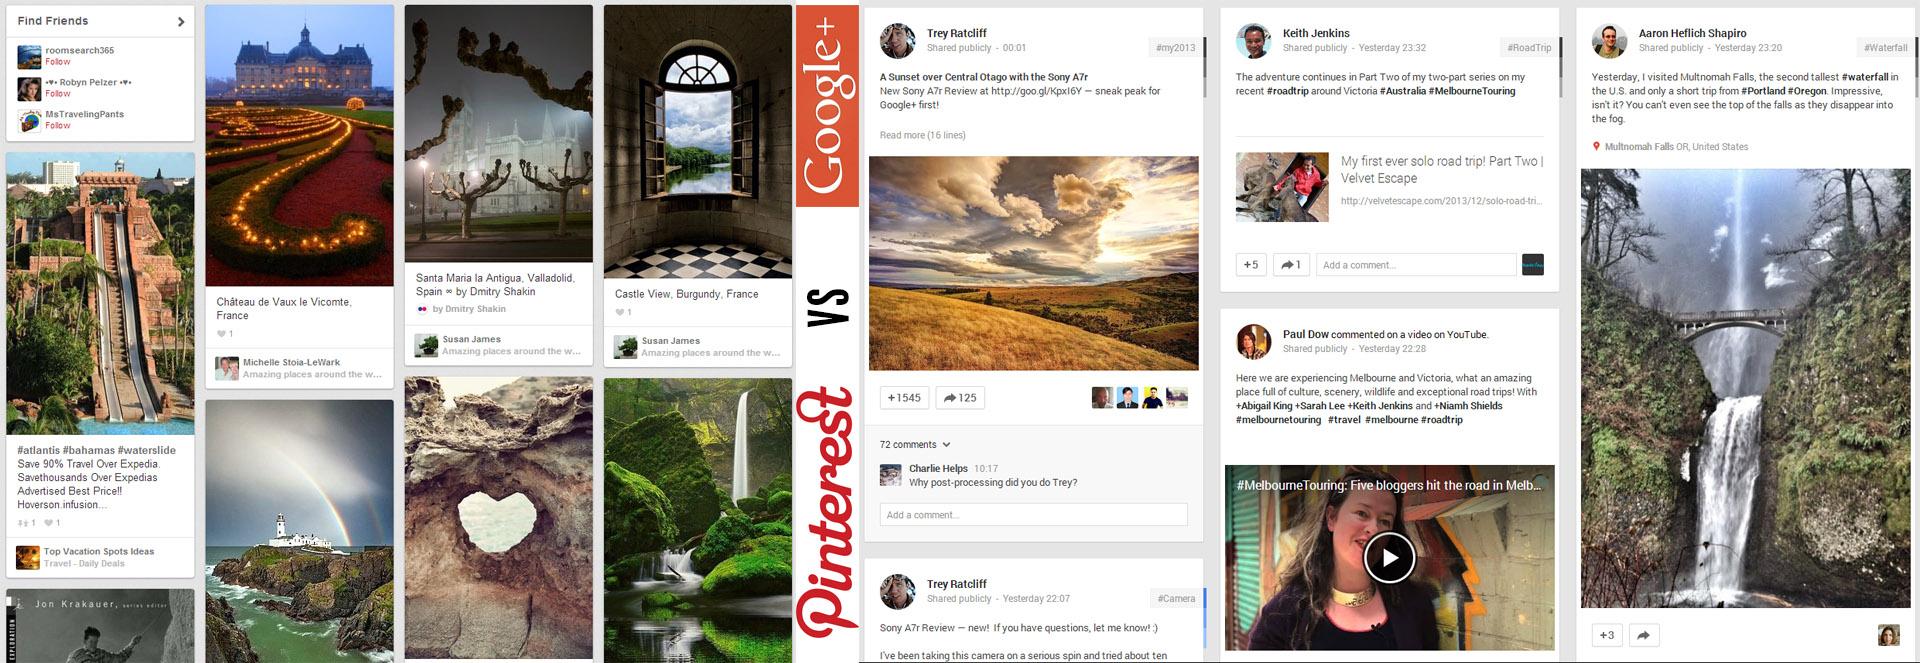 Pinterest and Google+ Design Comparison